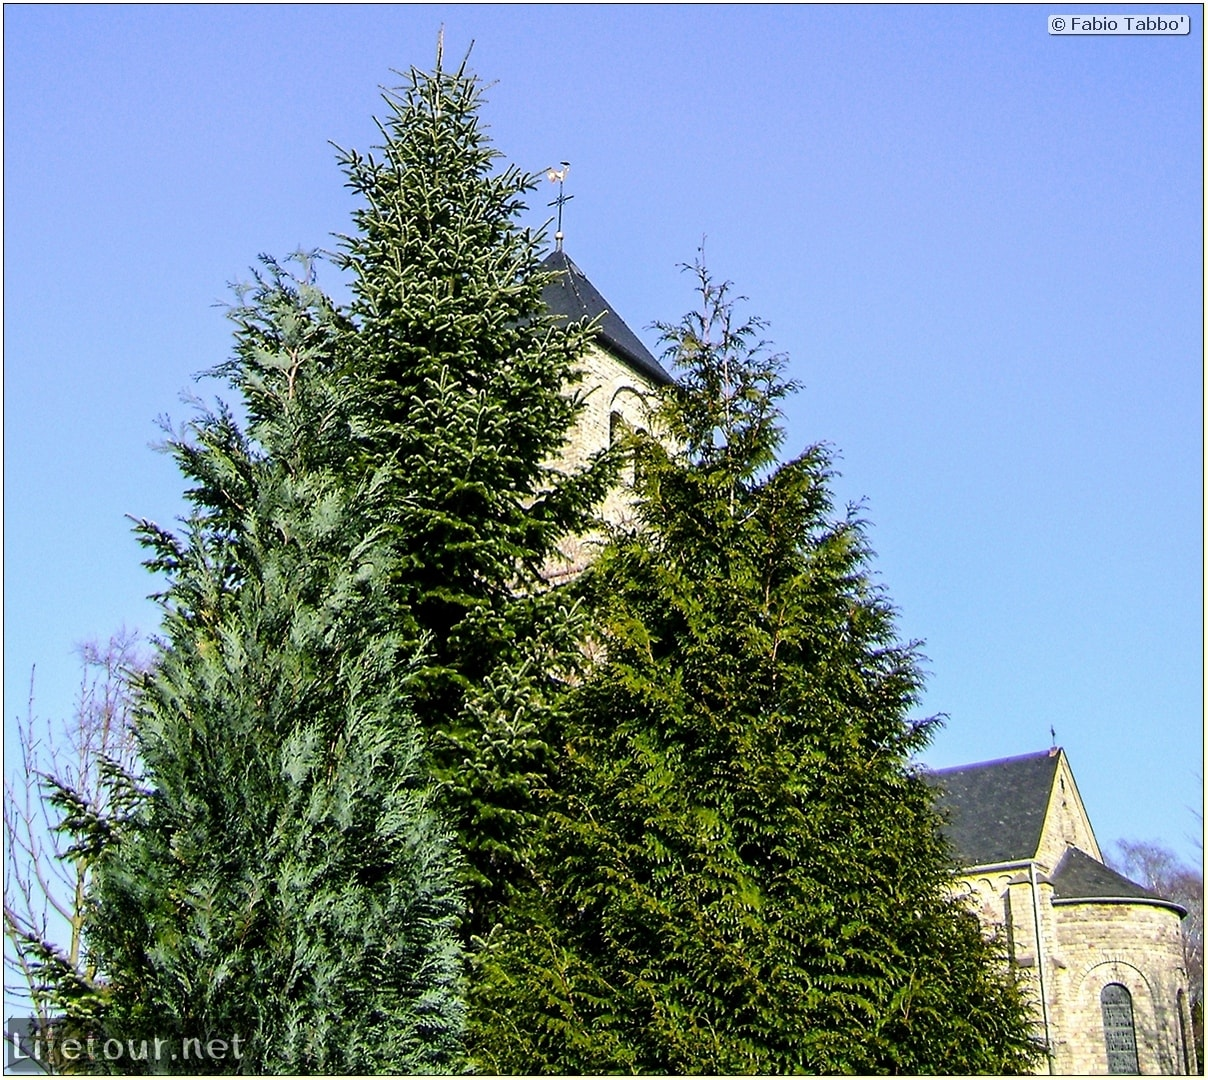 Fabio's LifeTour - Germany (2009 January) - Uckerath (Hennef) - Ev. Kirchengemeinde (Evangelical Church) - 16014 COVER